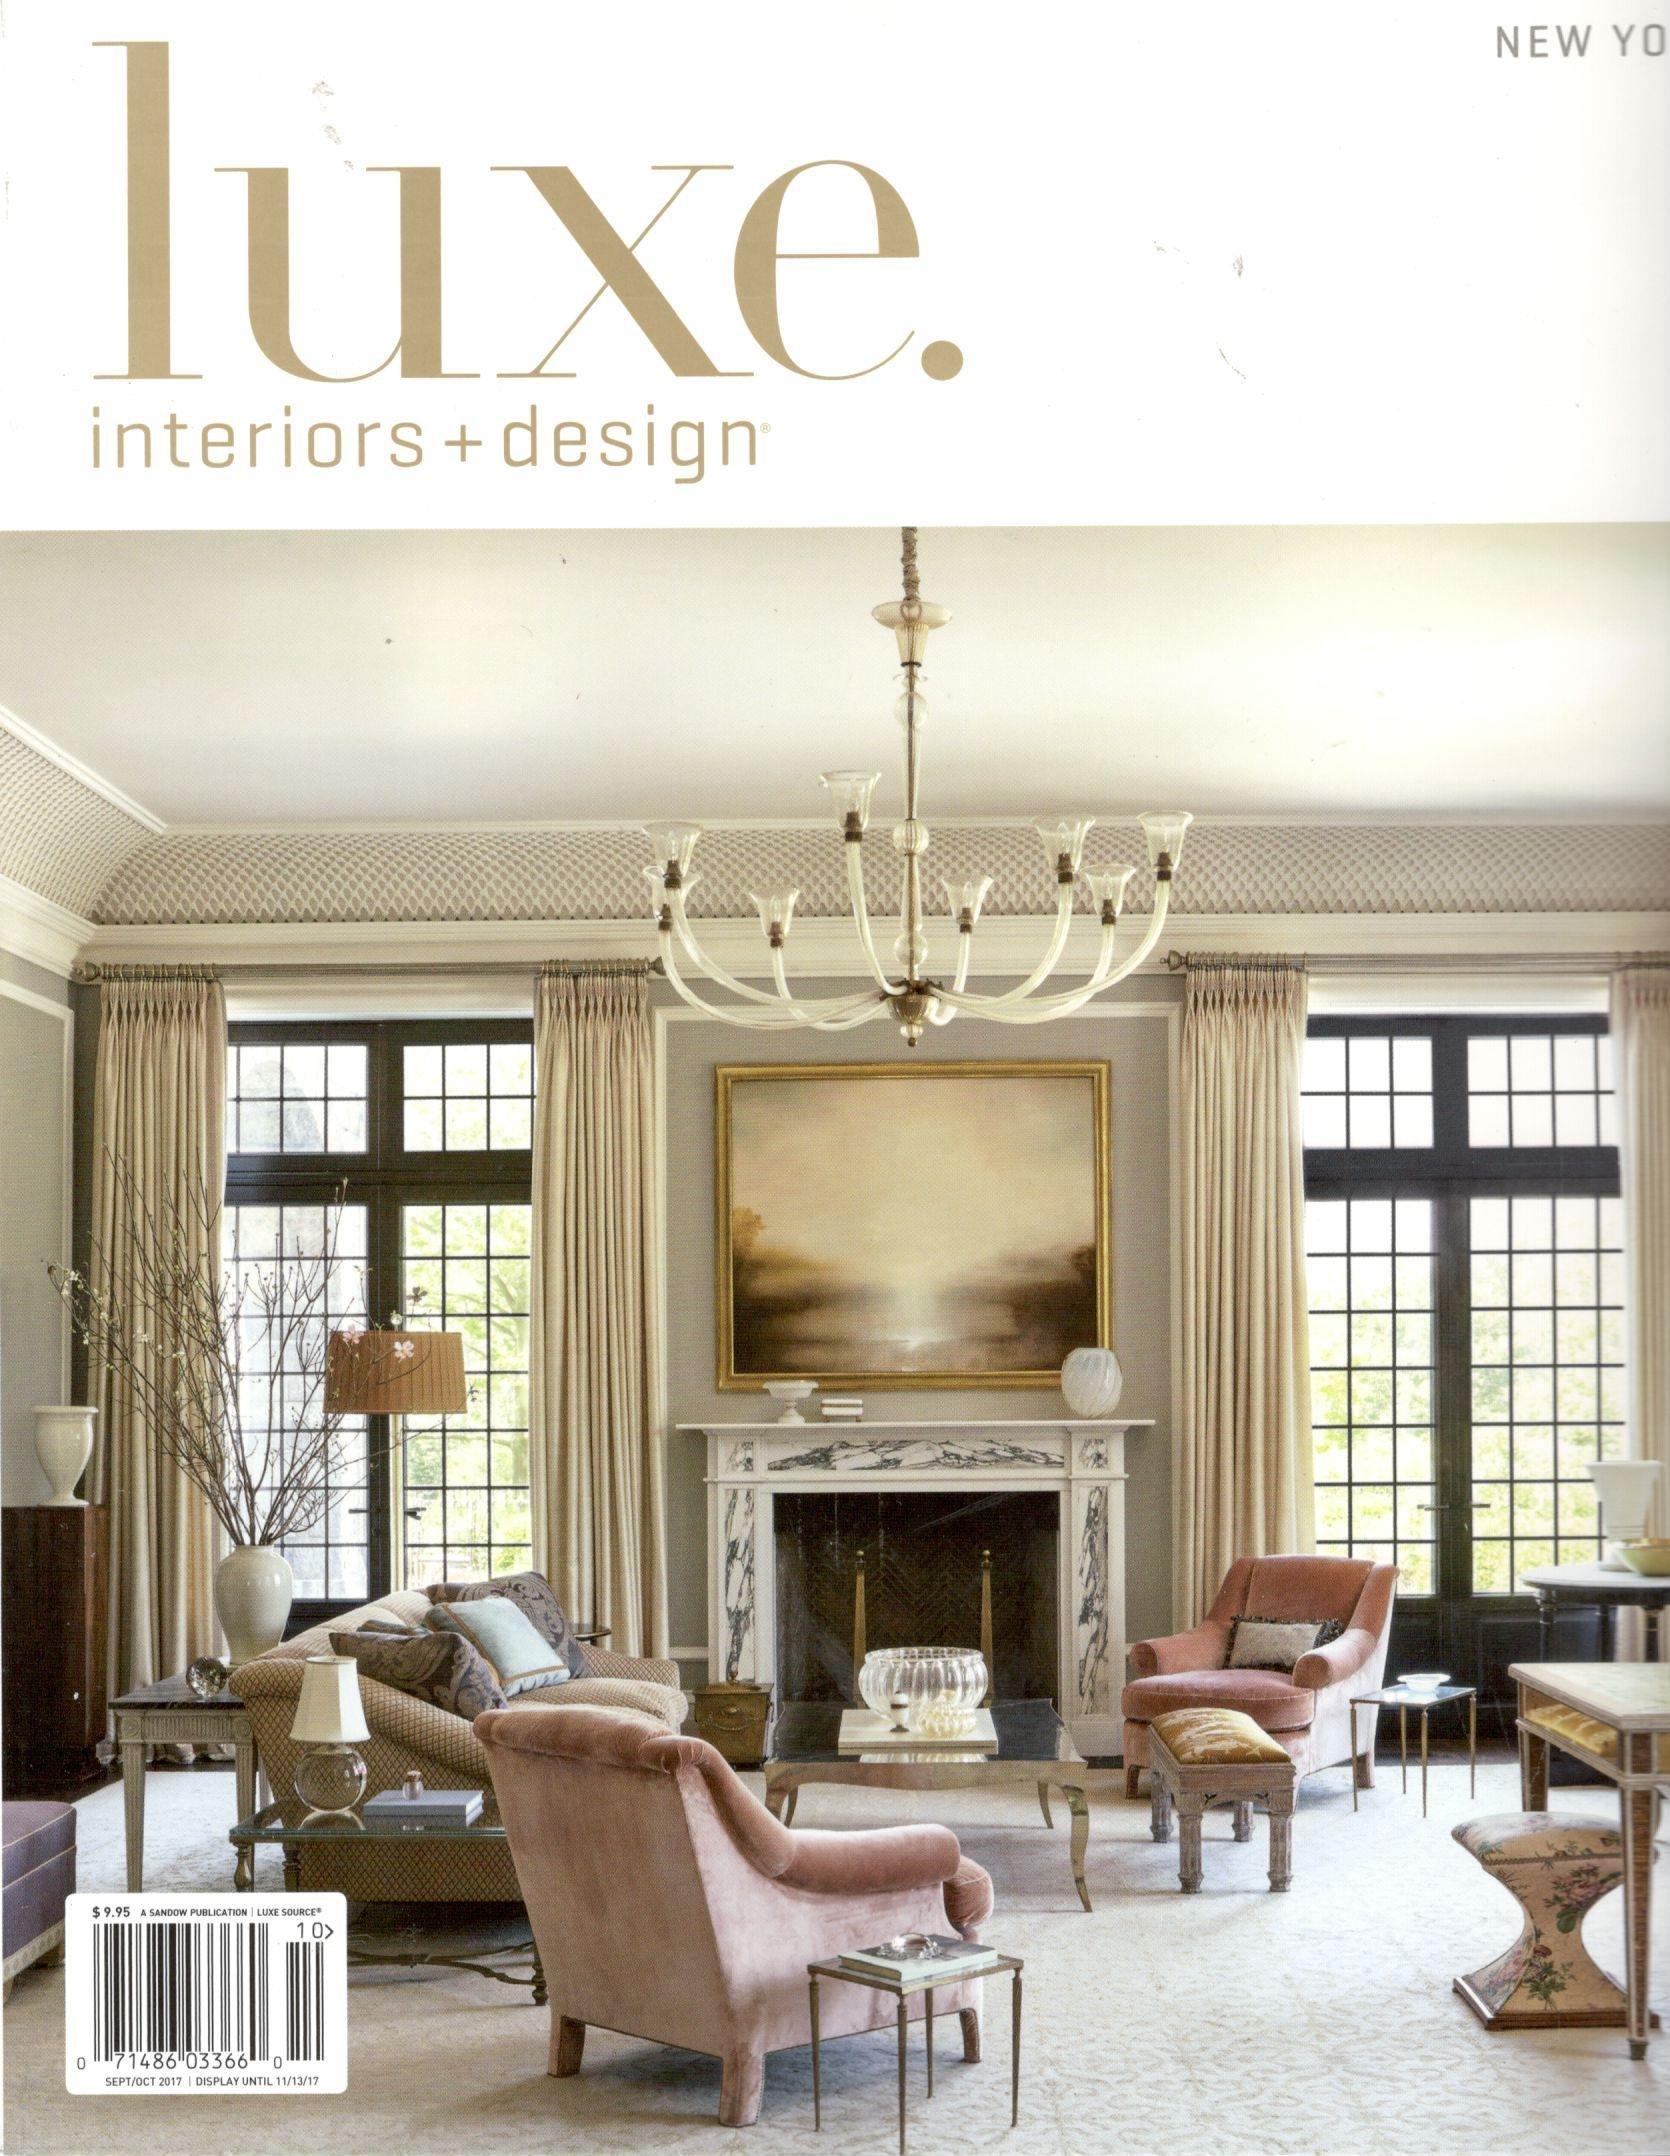 Luxe Interiors Design Magazine September October 2017 New York Edition 0764920177869 Amazon Com Books